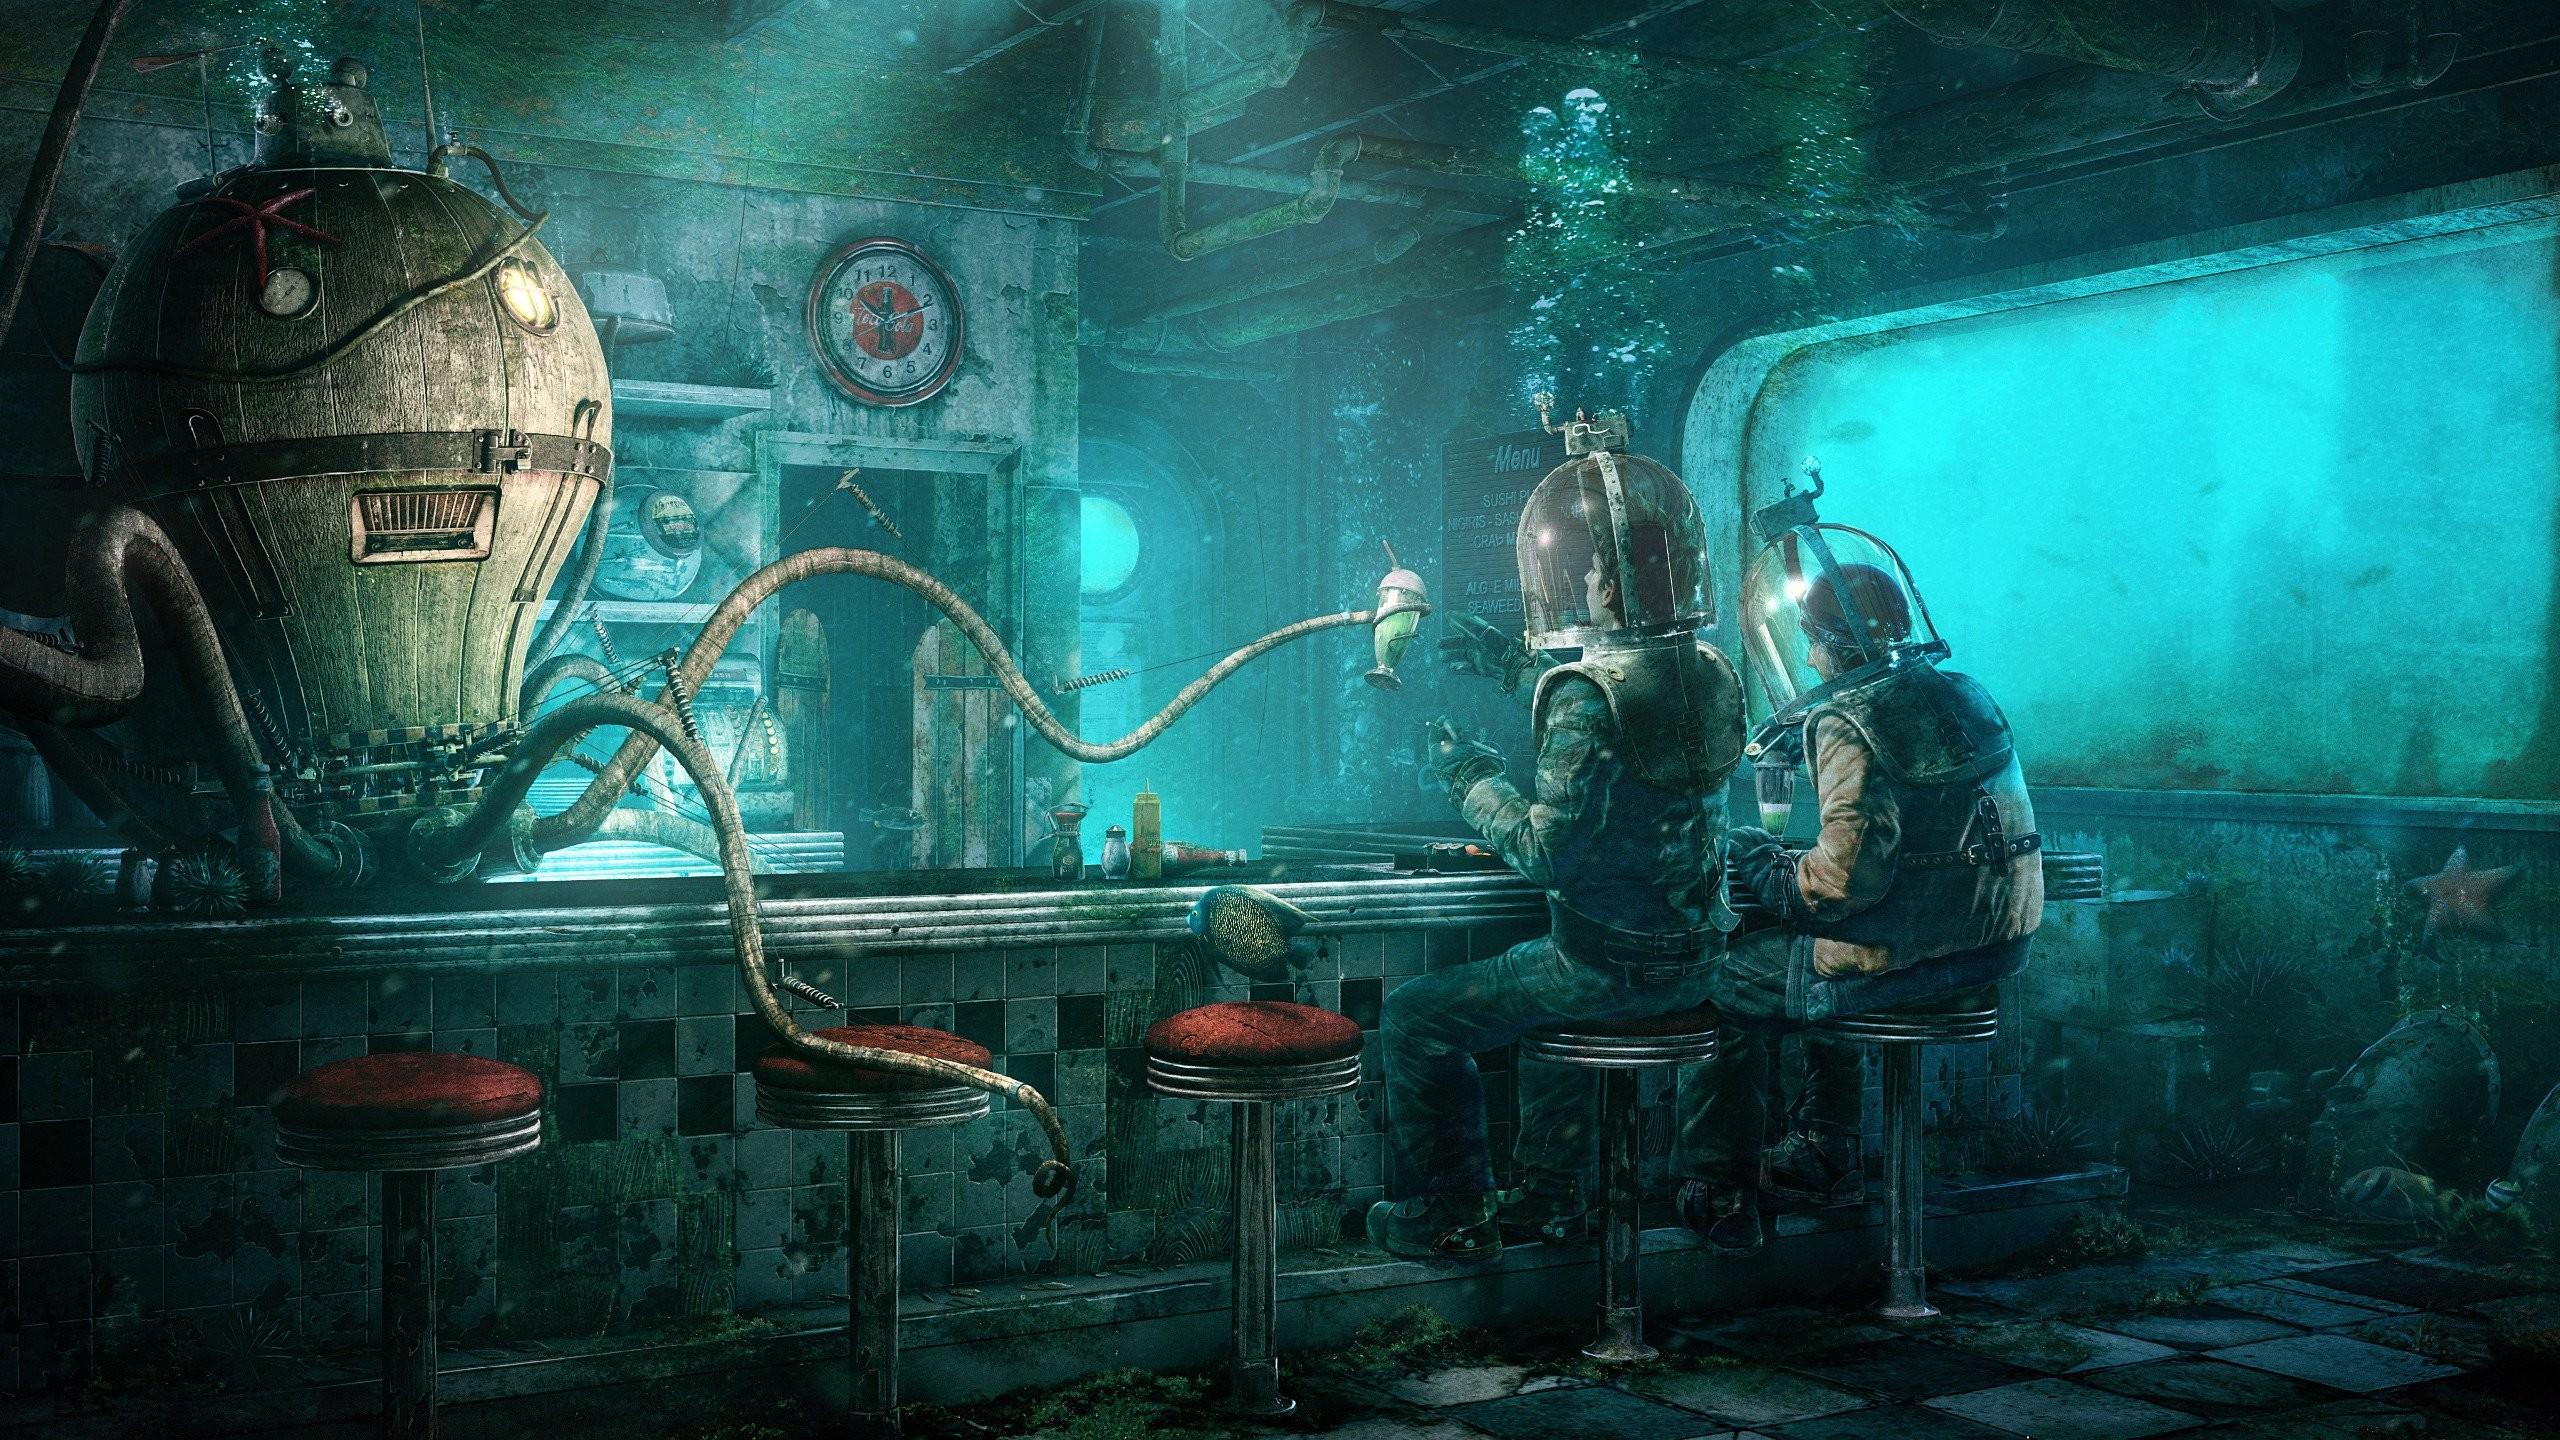 Sci-Fi Restaurant